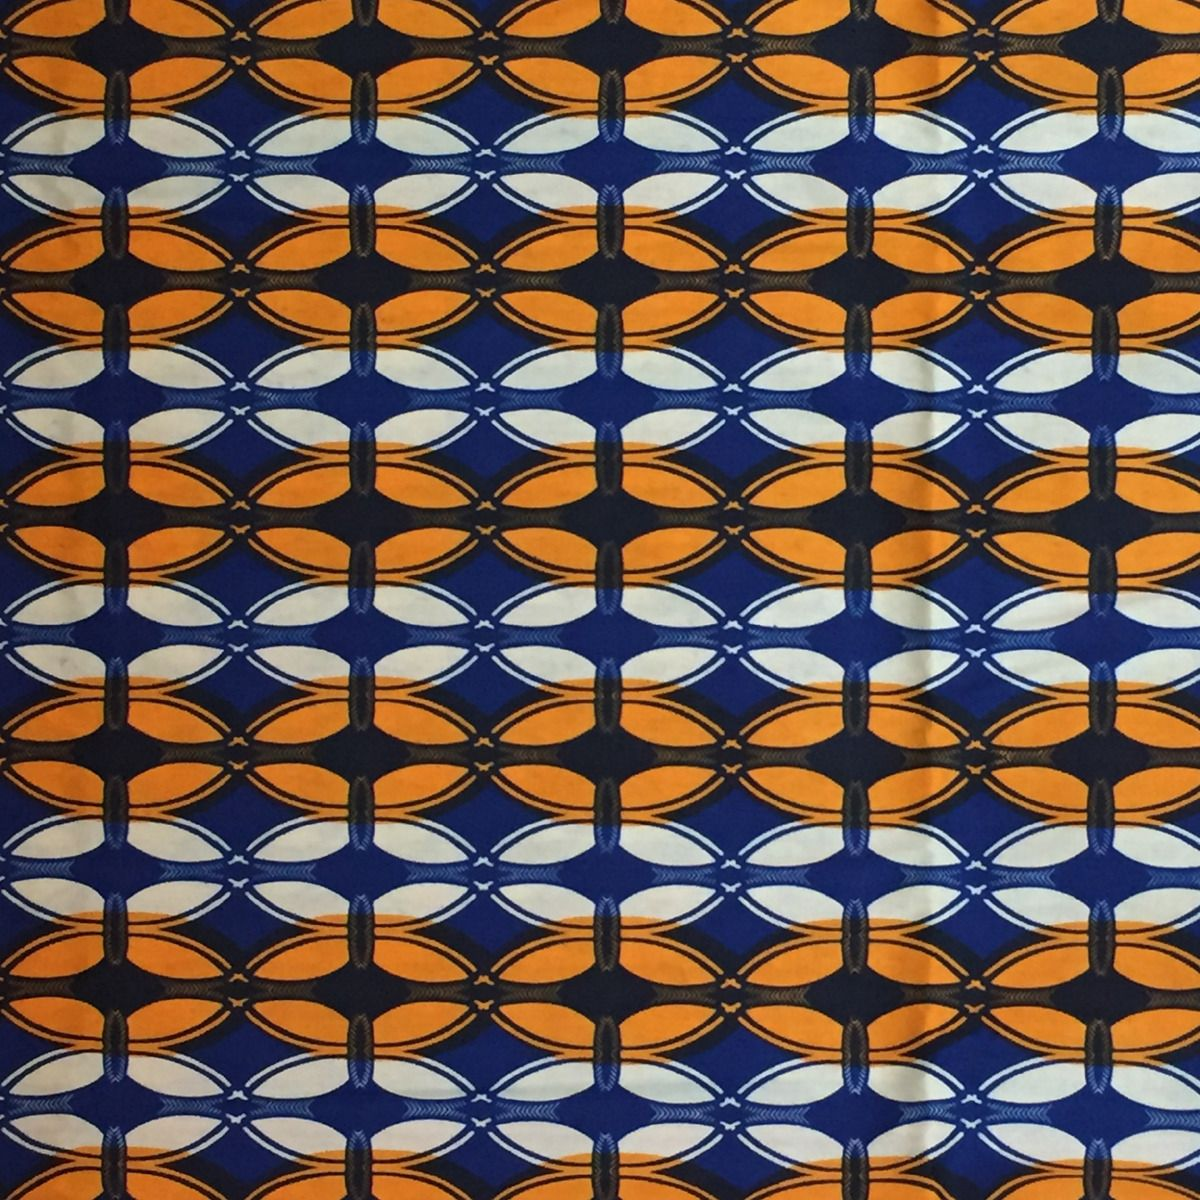 pagne wax 118 veritable wax block prints by phoenix hitarget tissu africain asq en 2018. Black Bedroom Furniture Sets. Home Design Ideas